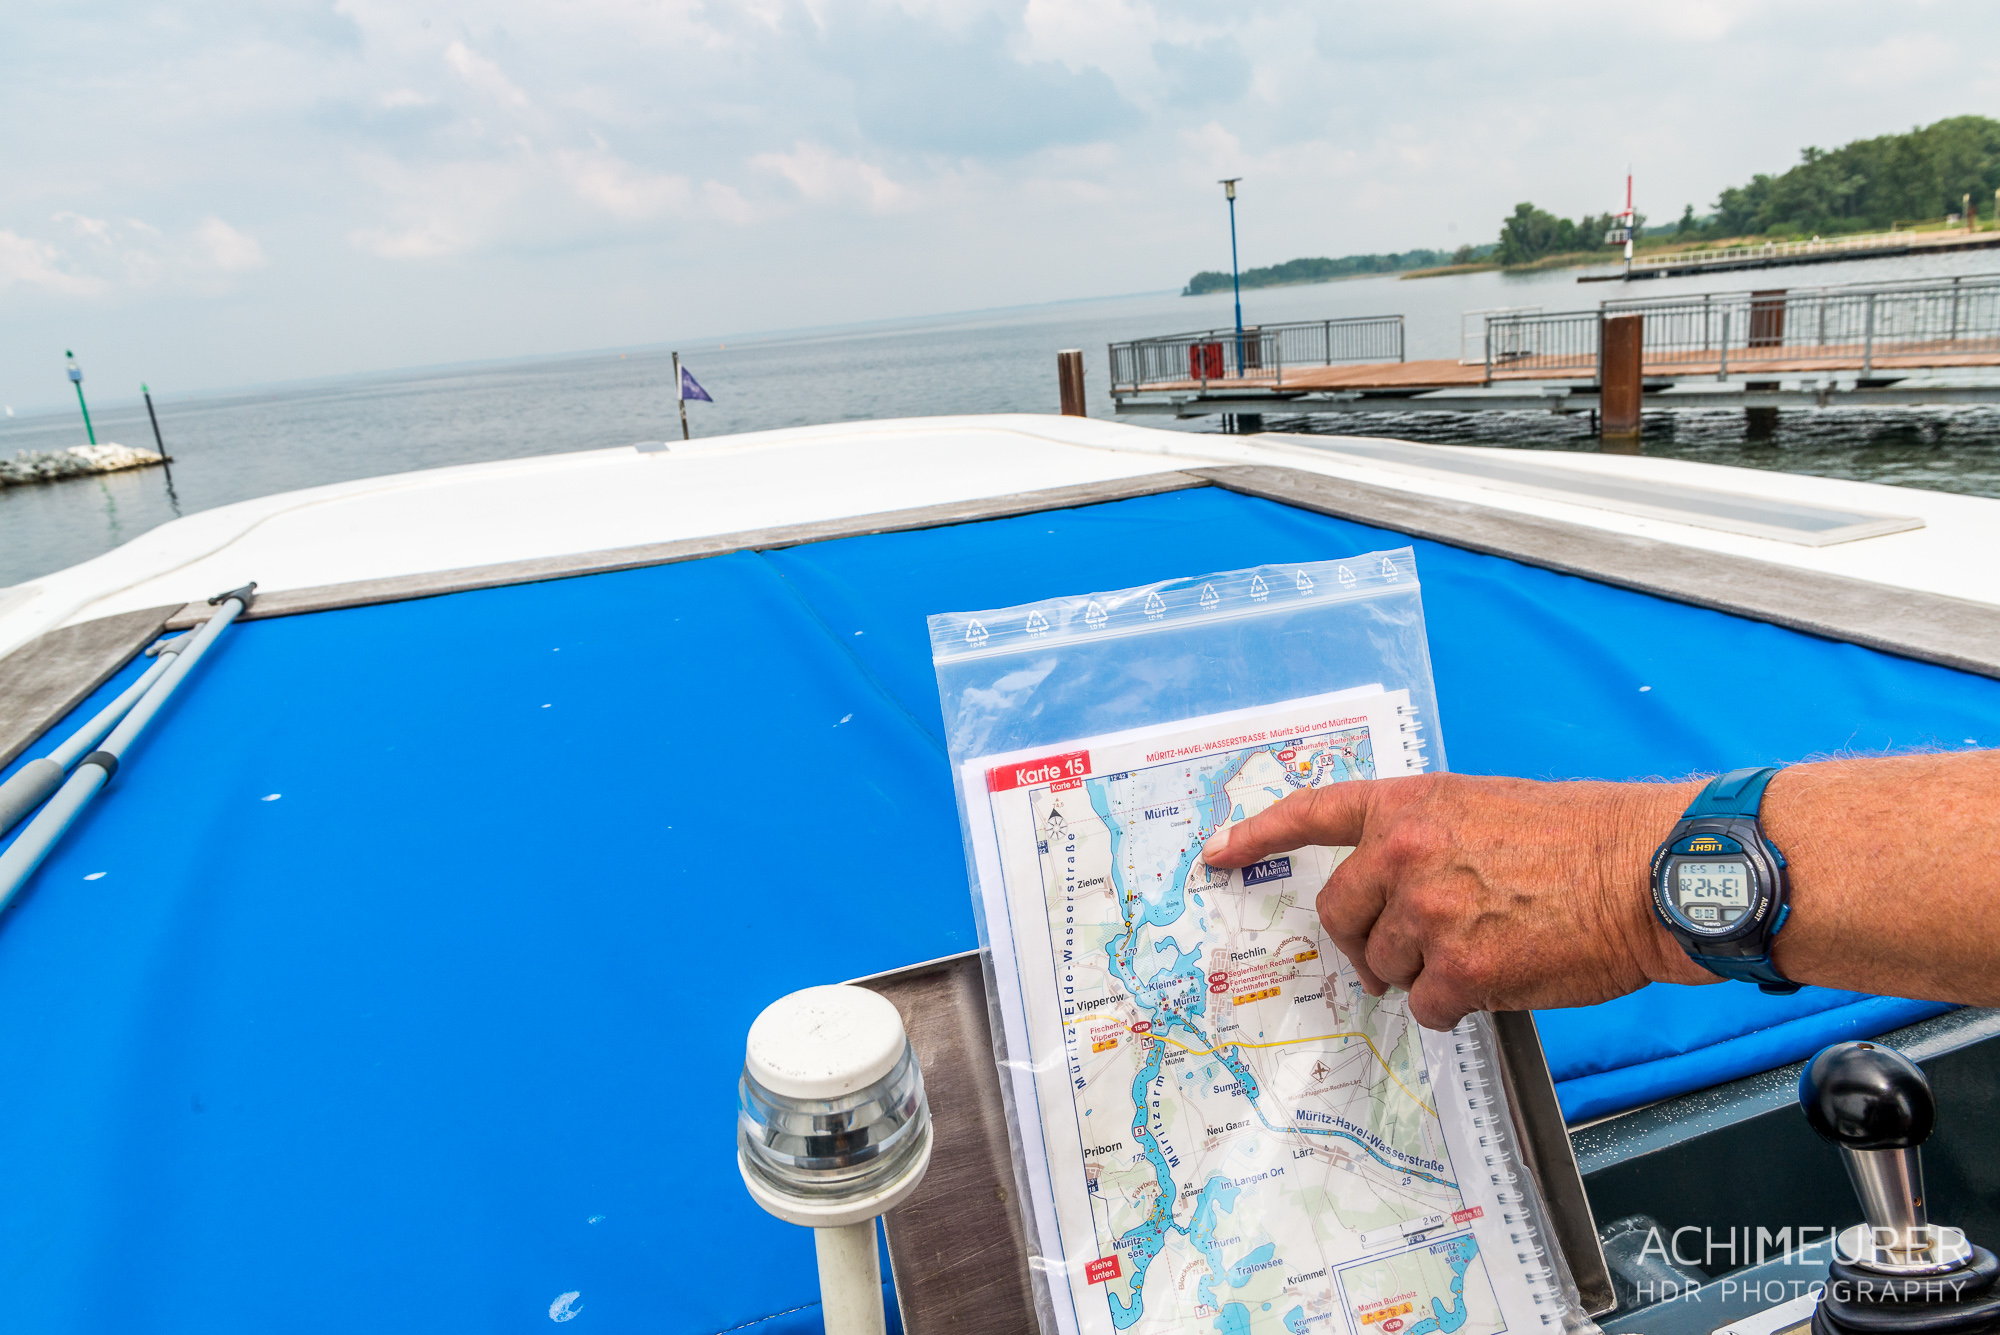 Hausboot-Kuhnle-Mueritz-Mecklenburg-Vorpommern-See_2529